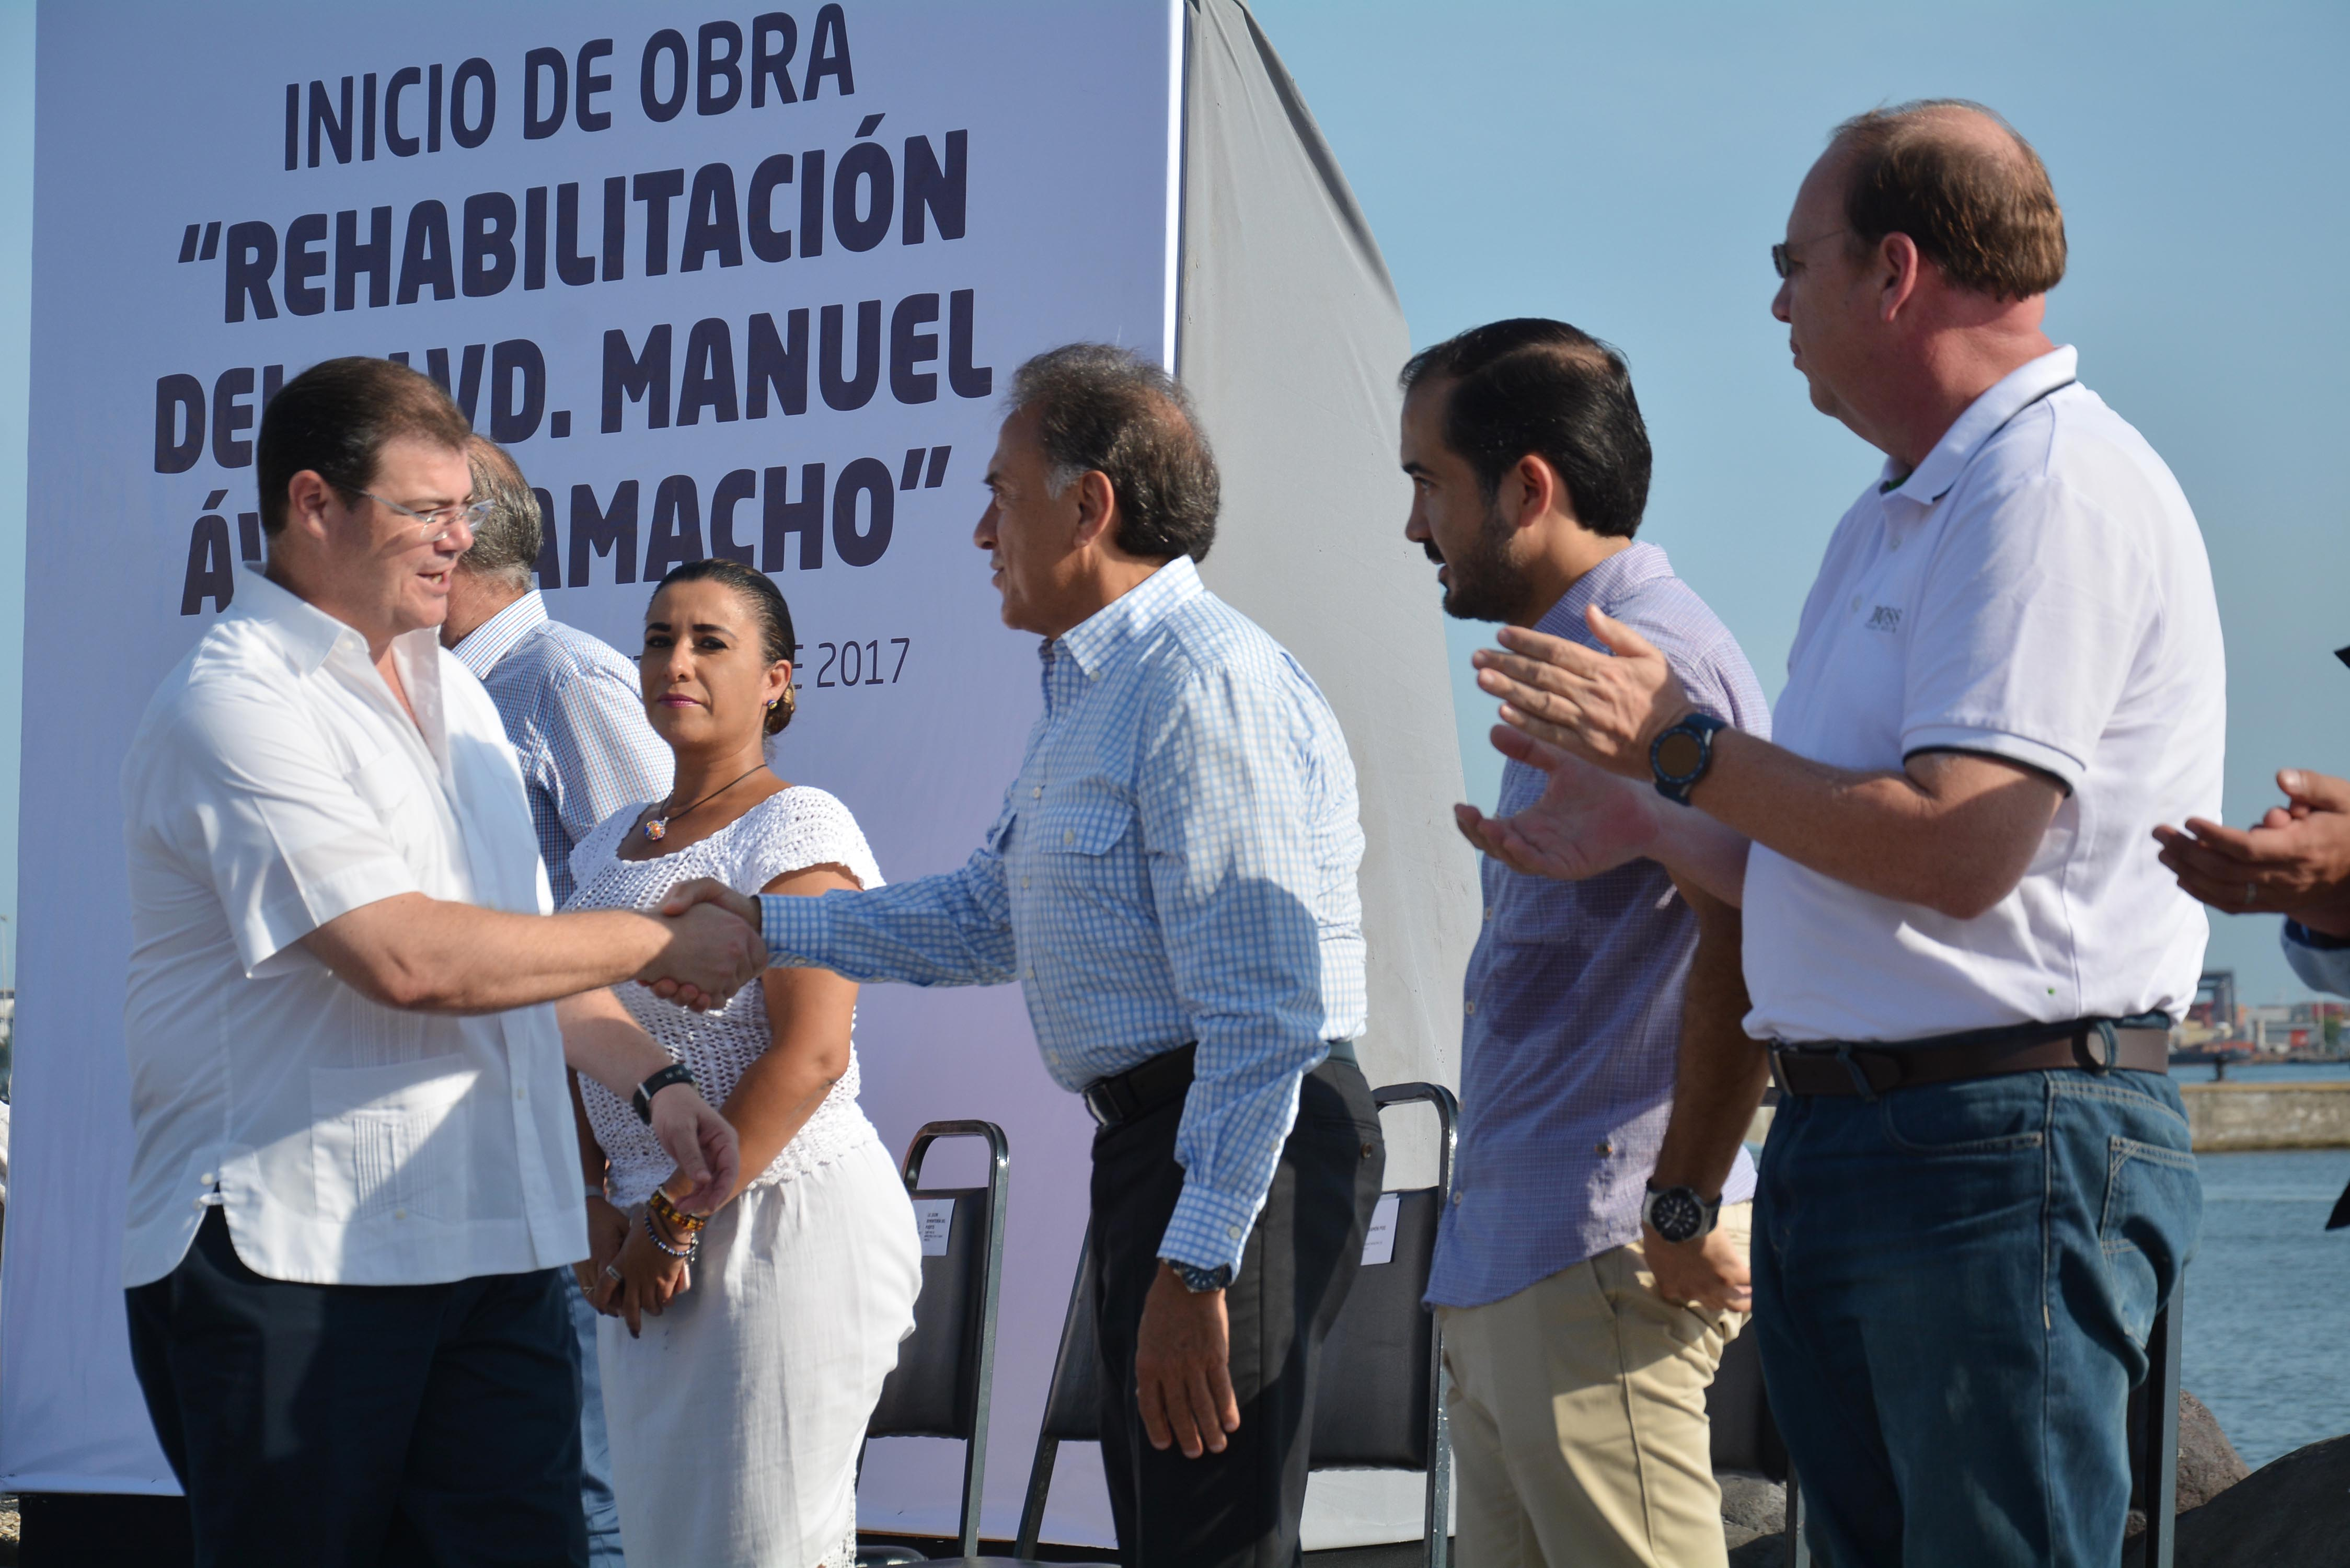 Inicia obra de rehabilitación en Boulevard Manuel Ávila Camacho